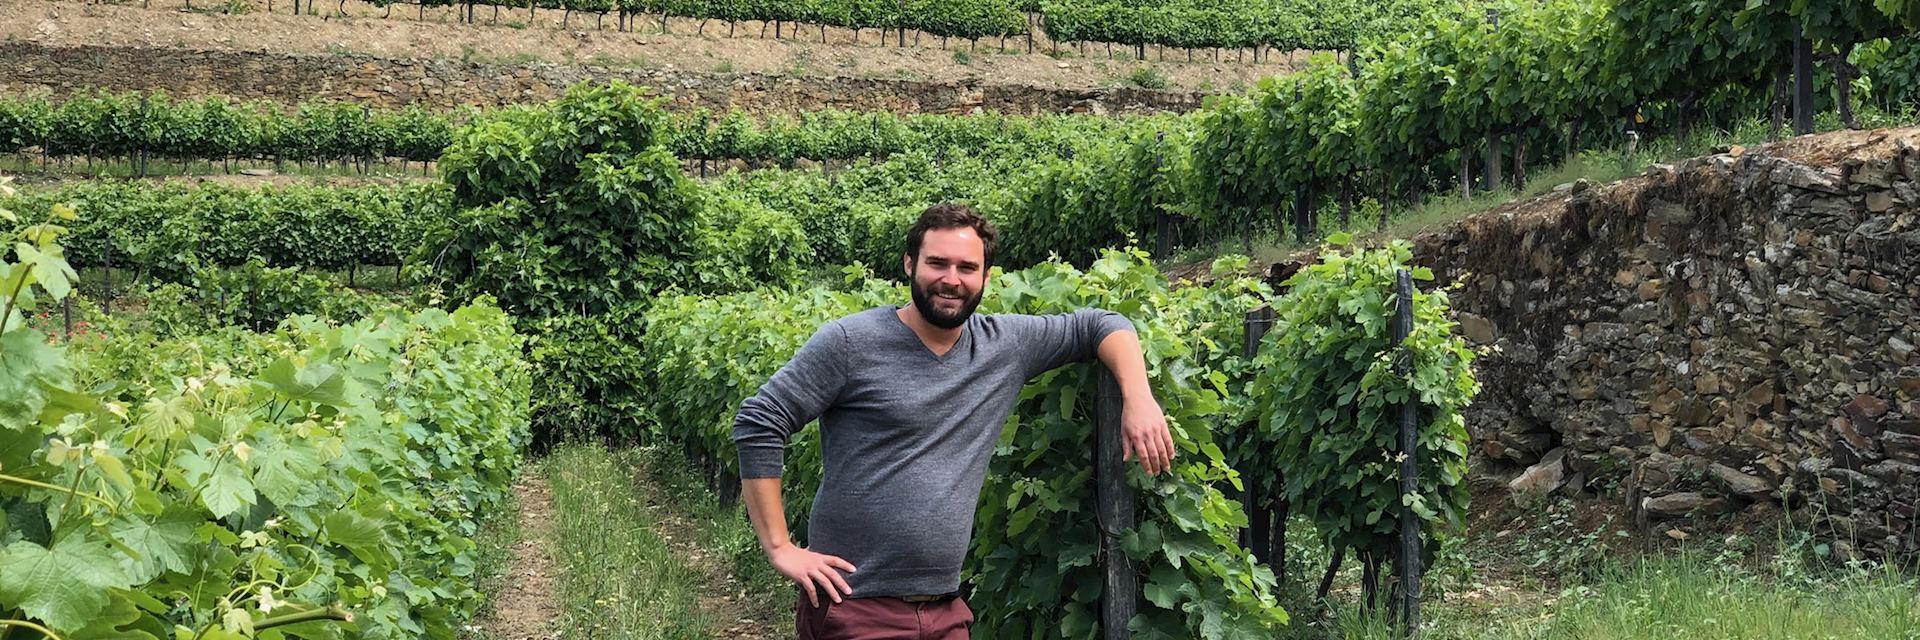 Geoff in the vineyards at Quinta de Bomfim, Portugal